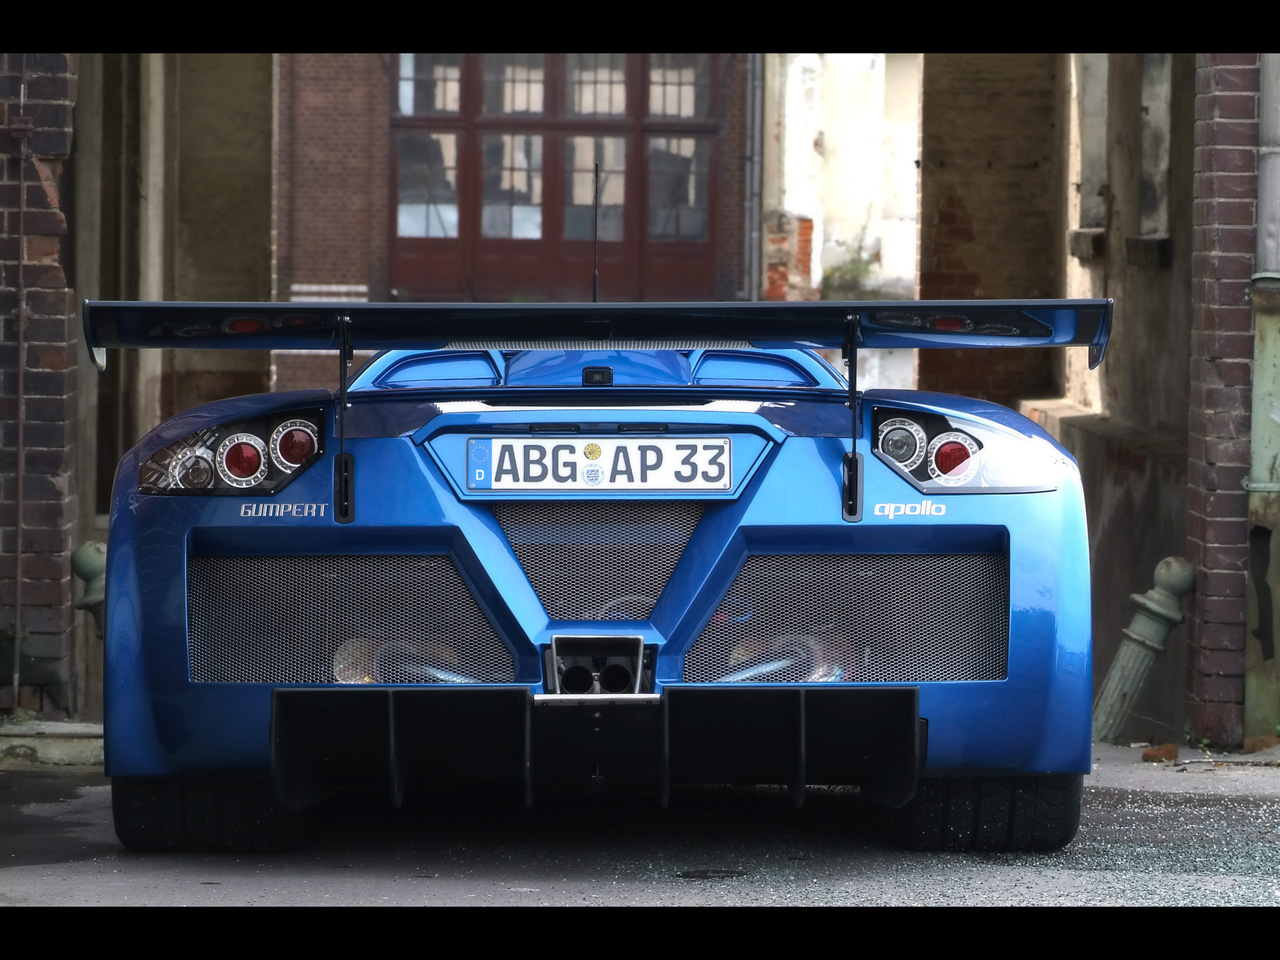 http://1.bp.blogspot.com/-Fw9K5G_rA20/TnkcDidlYZI/AAAAAAAAEeY/WPHzLTwHMFw/s1600/2008-Gumpert-Apollo-Sport-Blue-Rear-1280x960.jpg